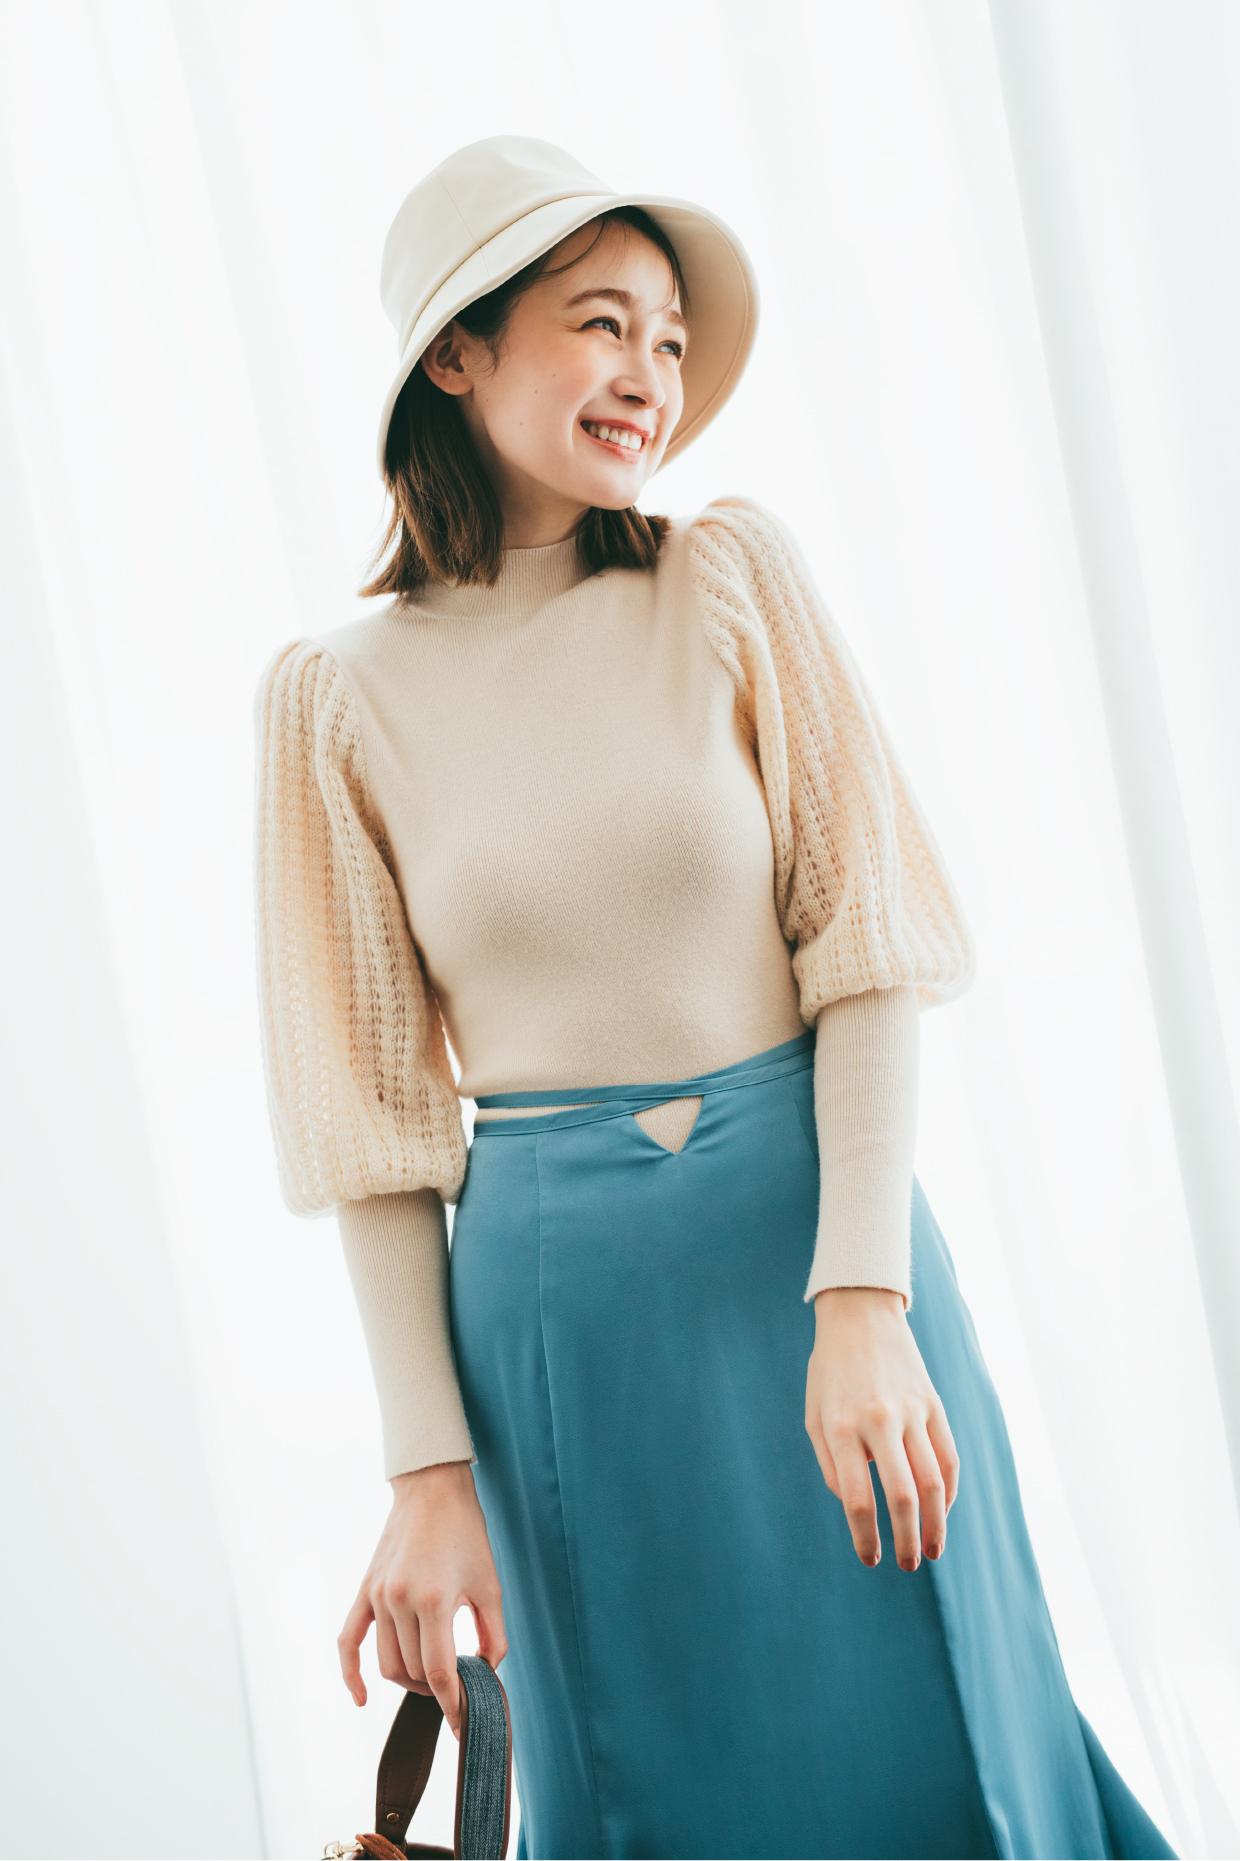 "How to wear? 7 KEY ITEMS SACHI FUJII モデル・藤井サチが着こなす""7つ""のキーアイテム"